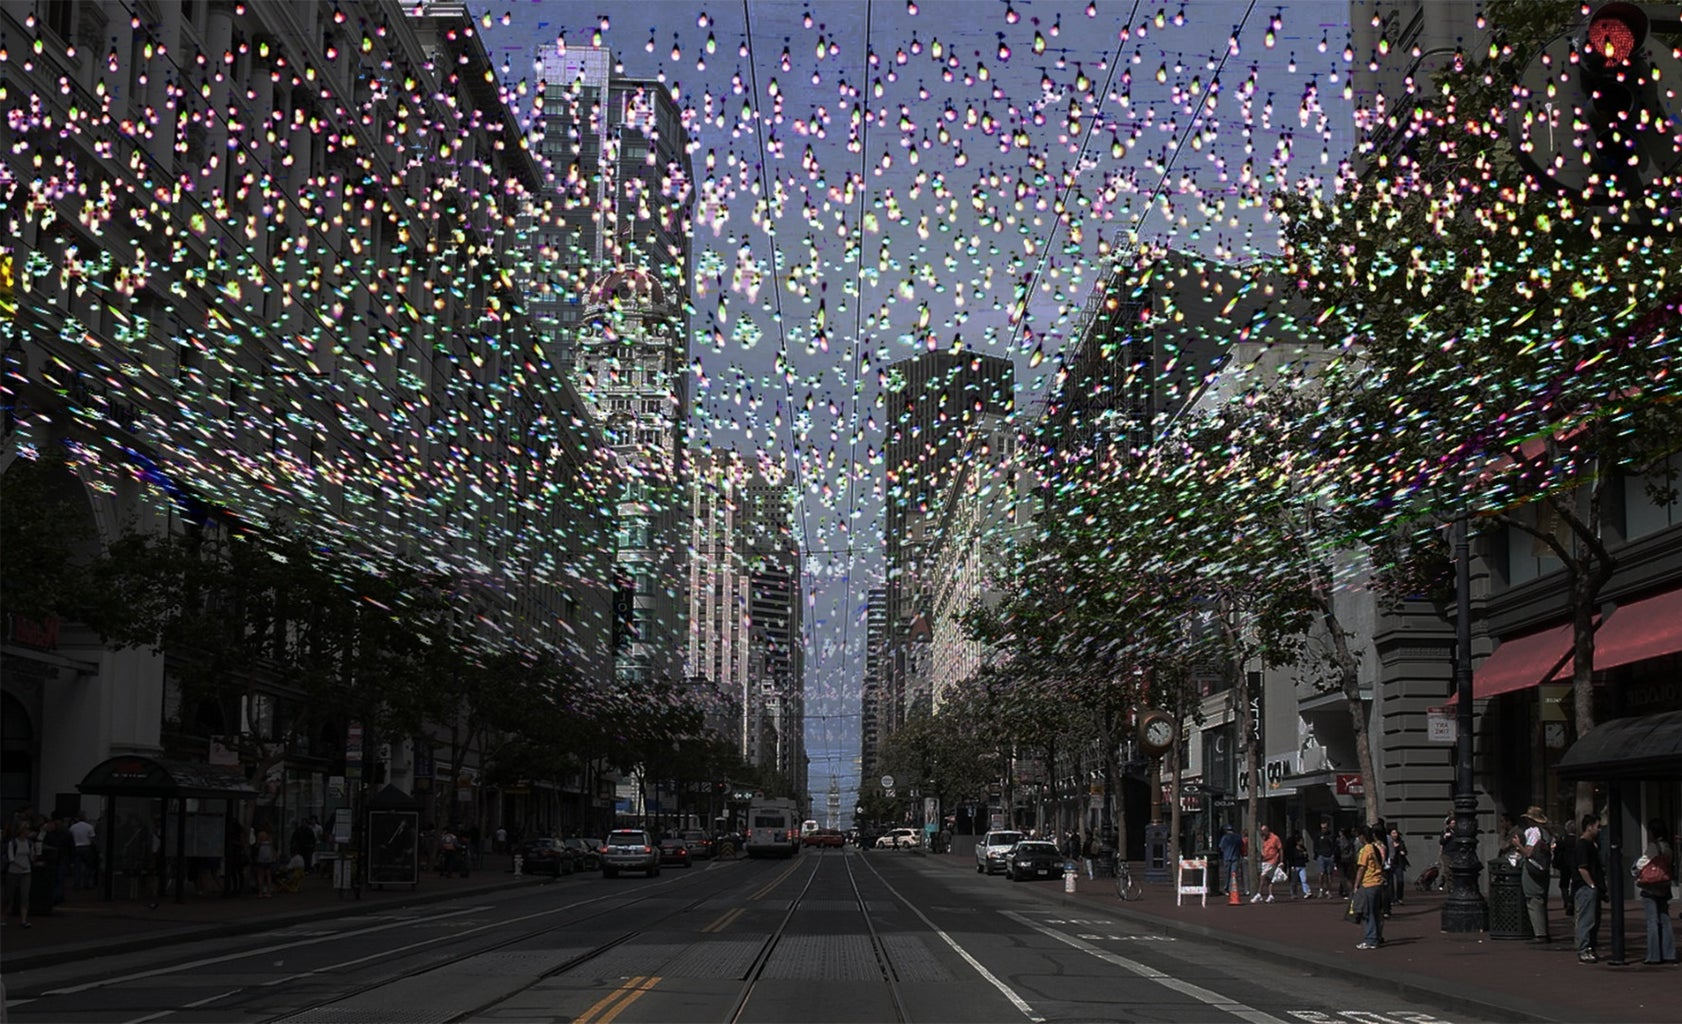 Shimmering Stars in Your Neighborhood